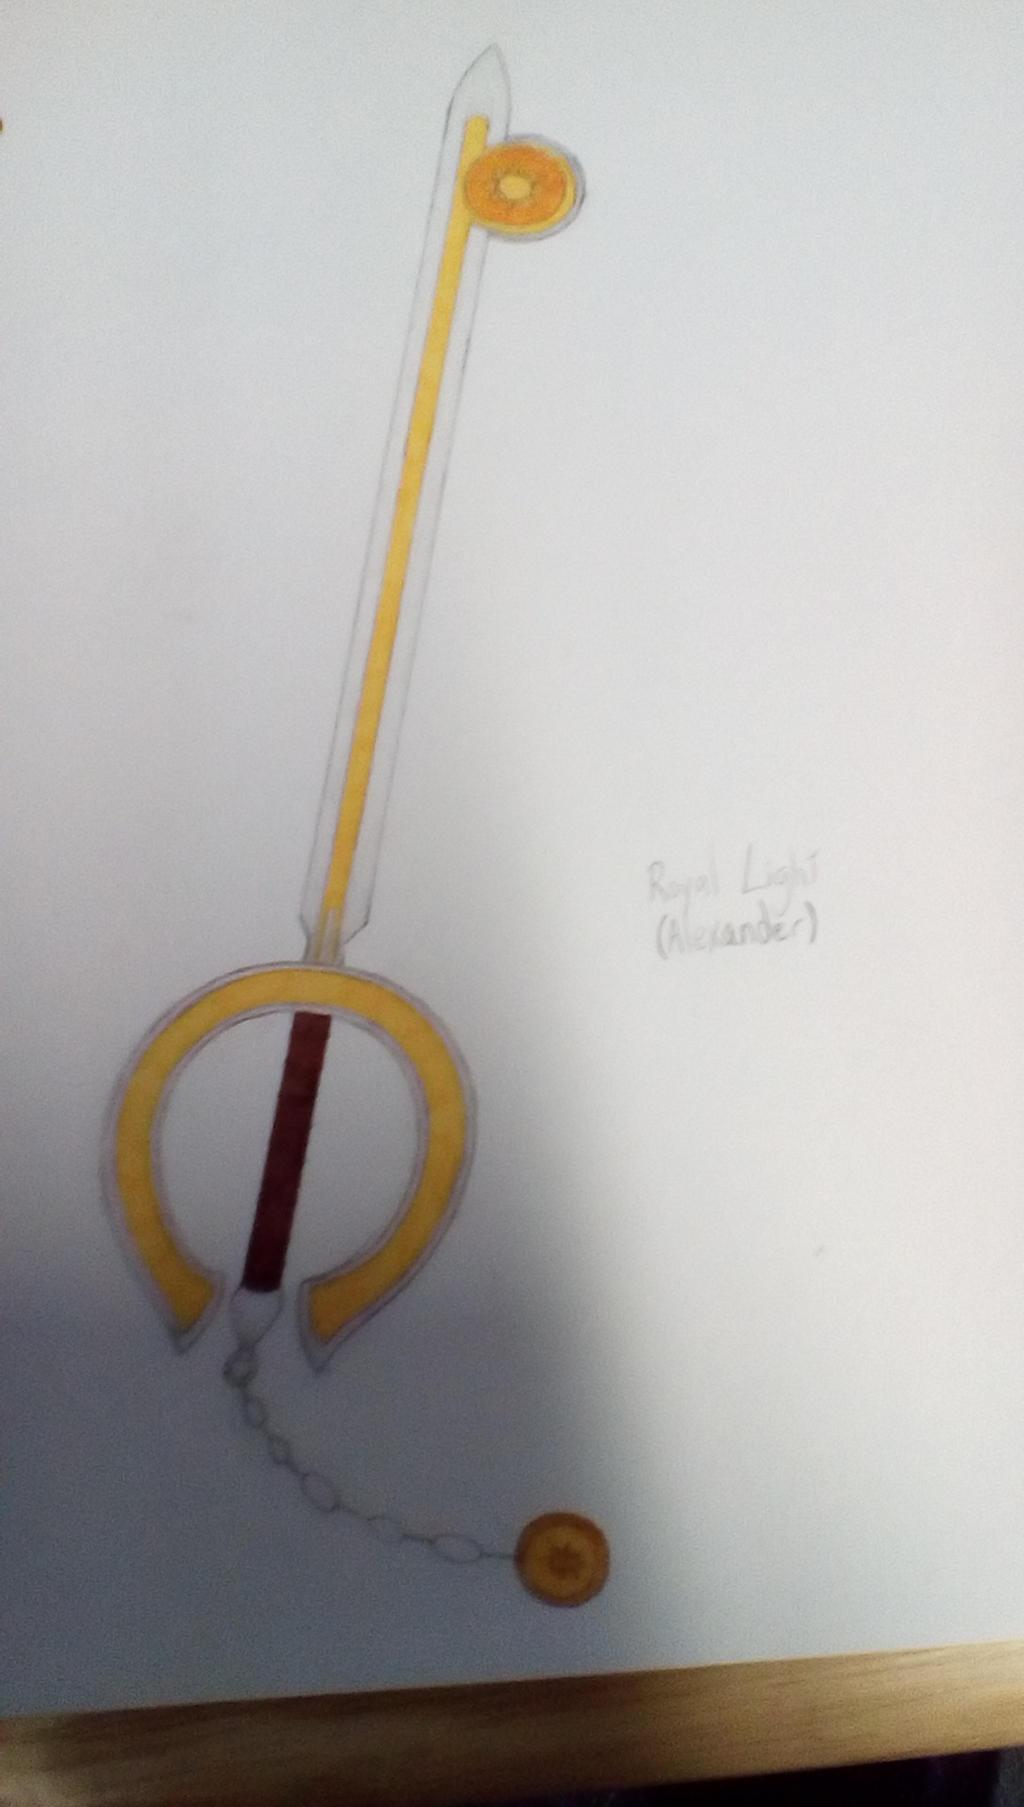 Alexander's Royal Light by Brightsworth-Heroes